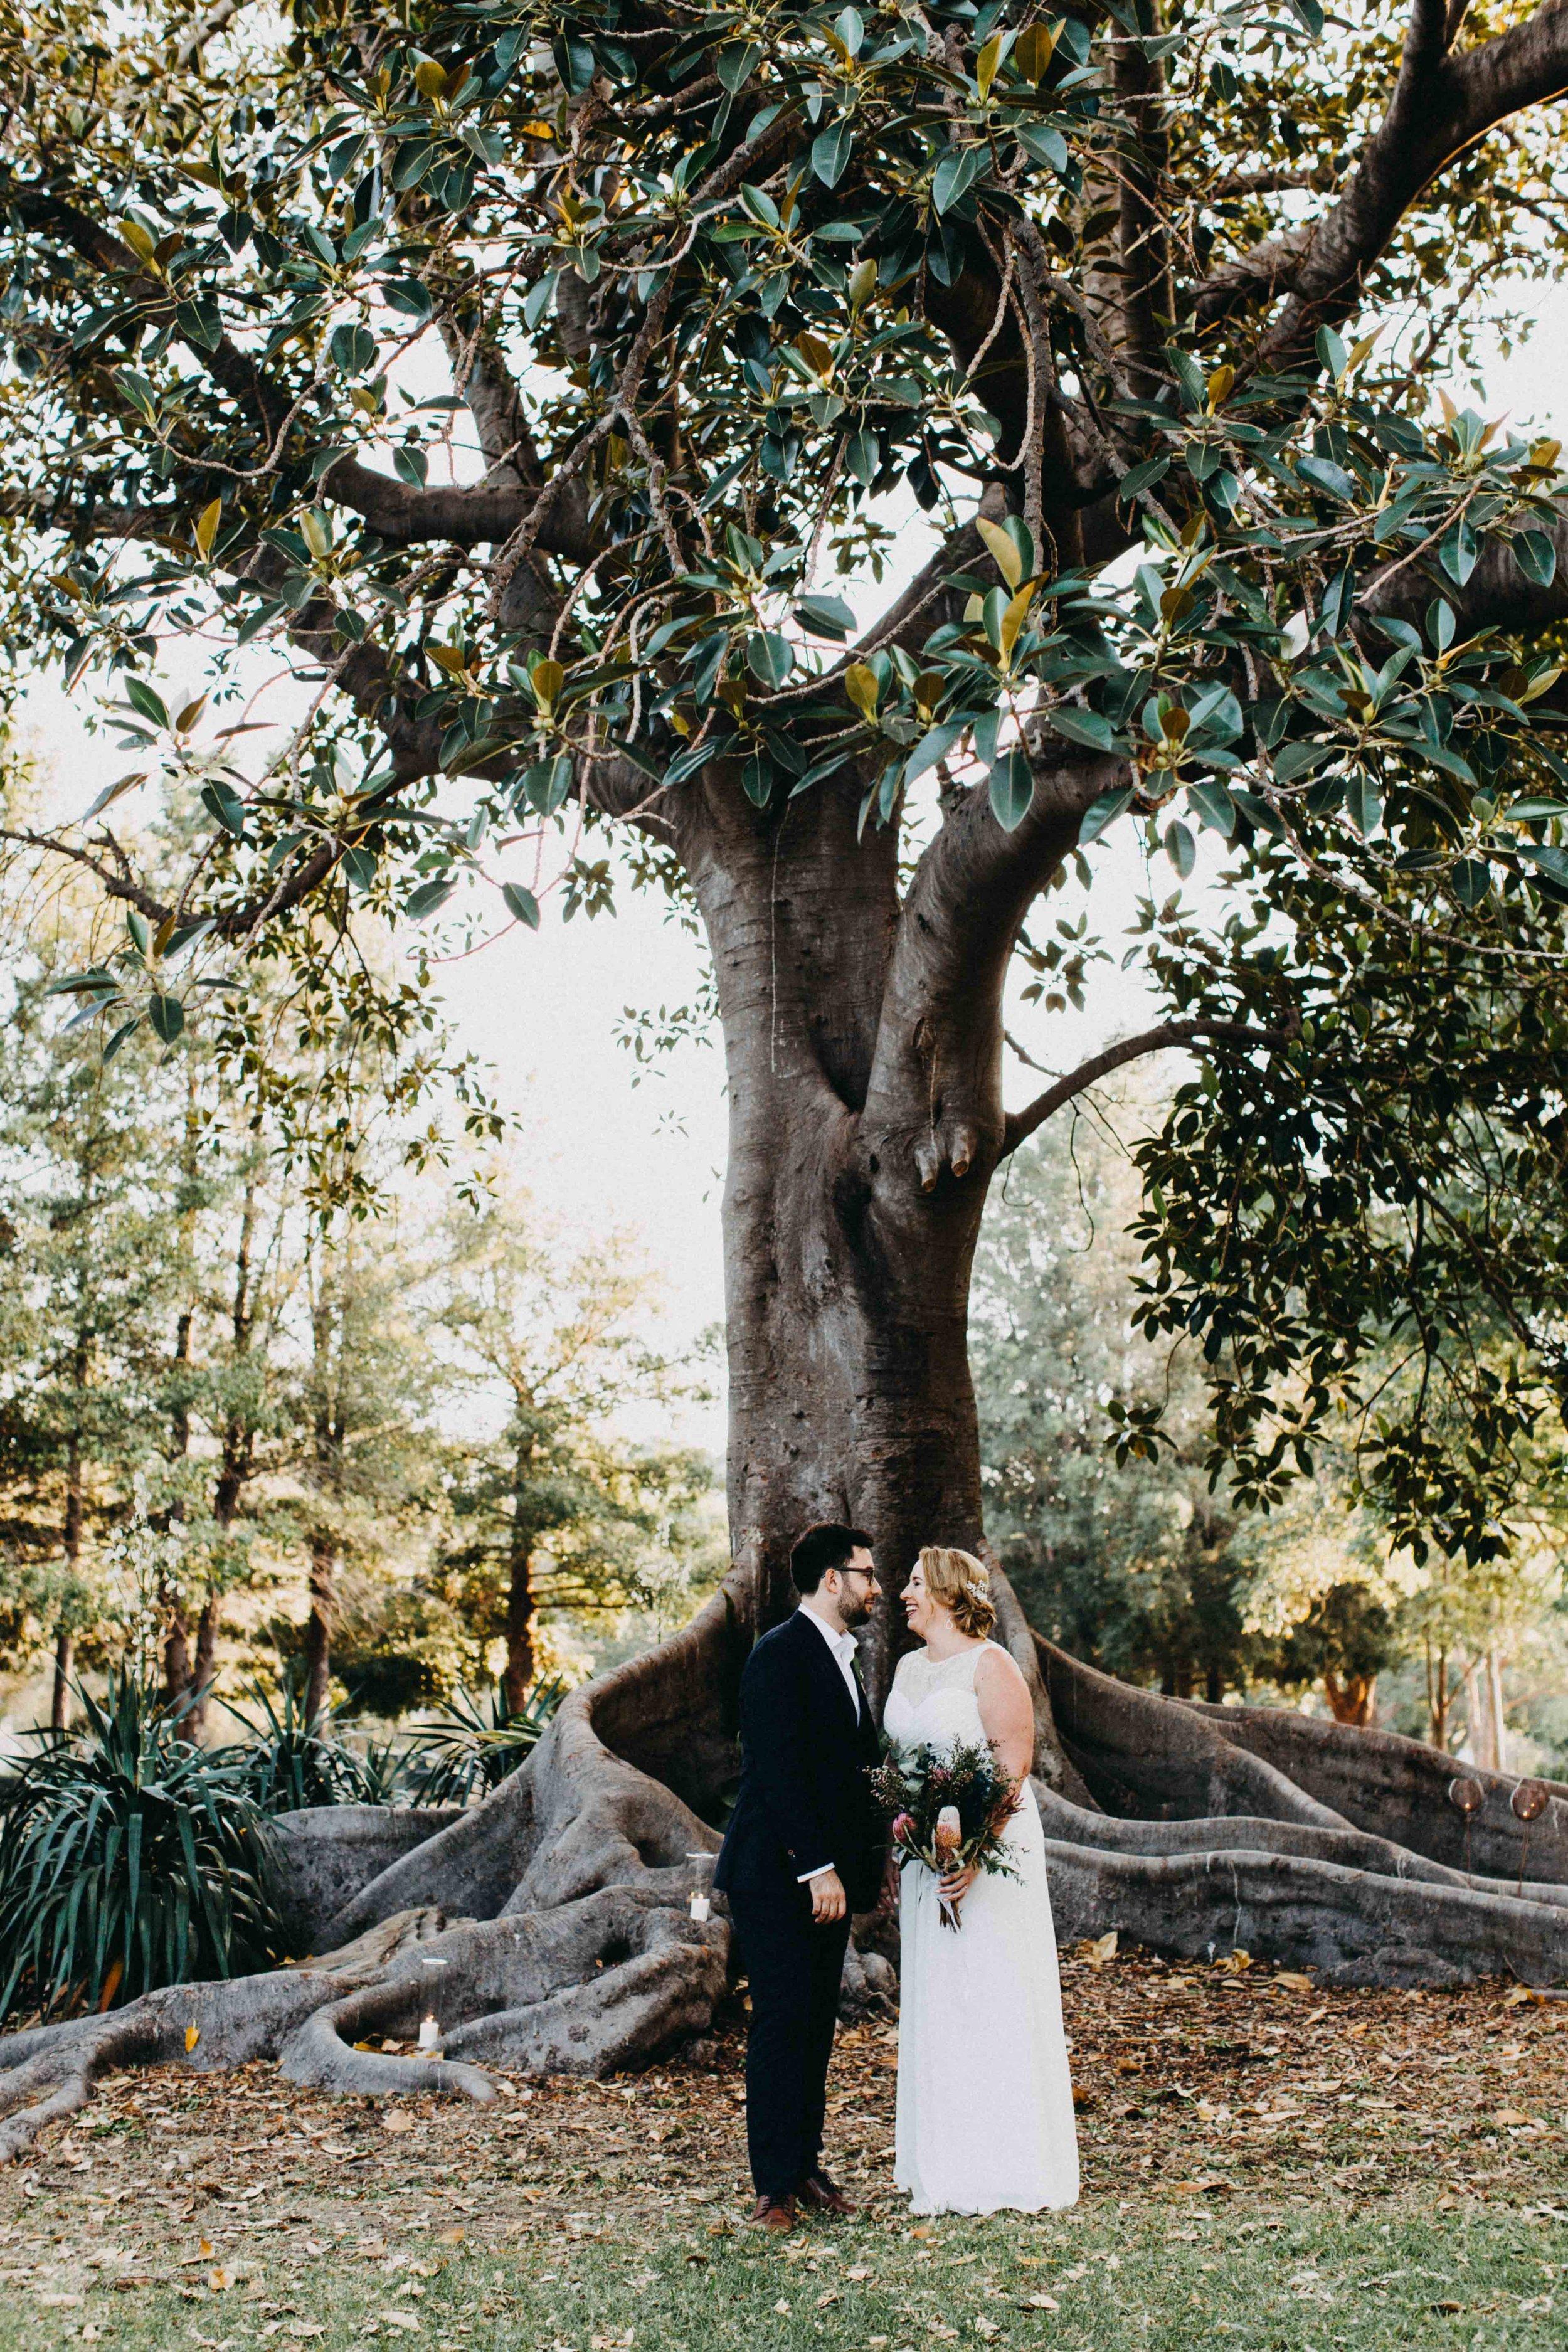 cabarita-park-sydney-wedding-emilyobrienphotography.net-39.jpg